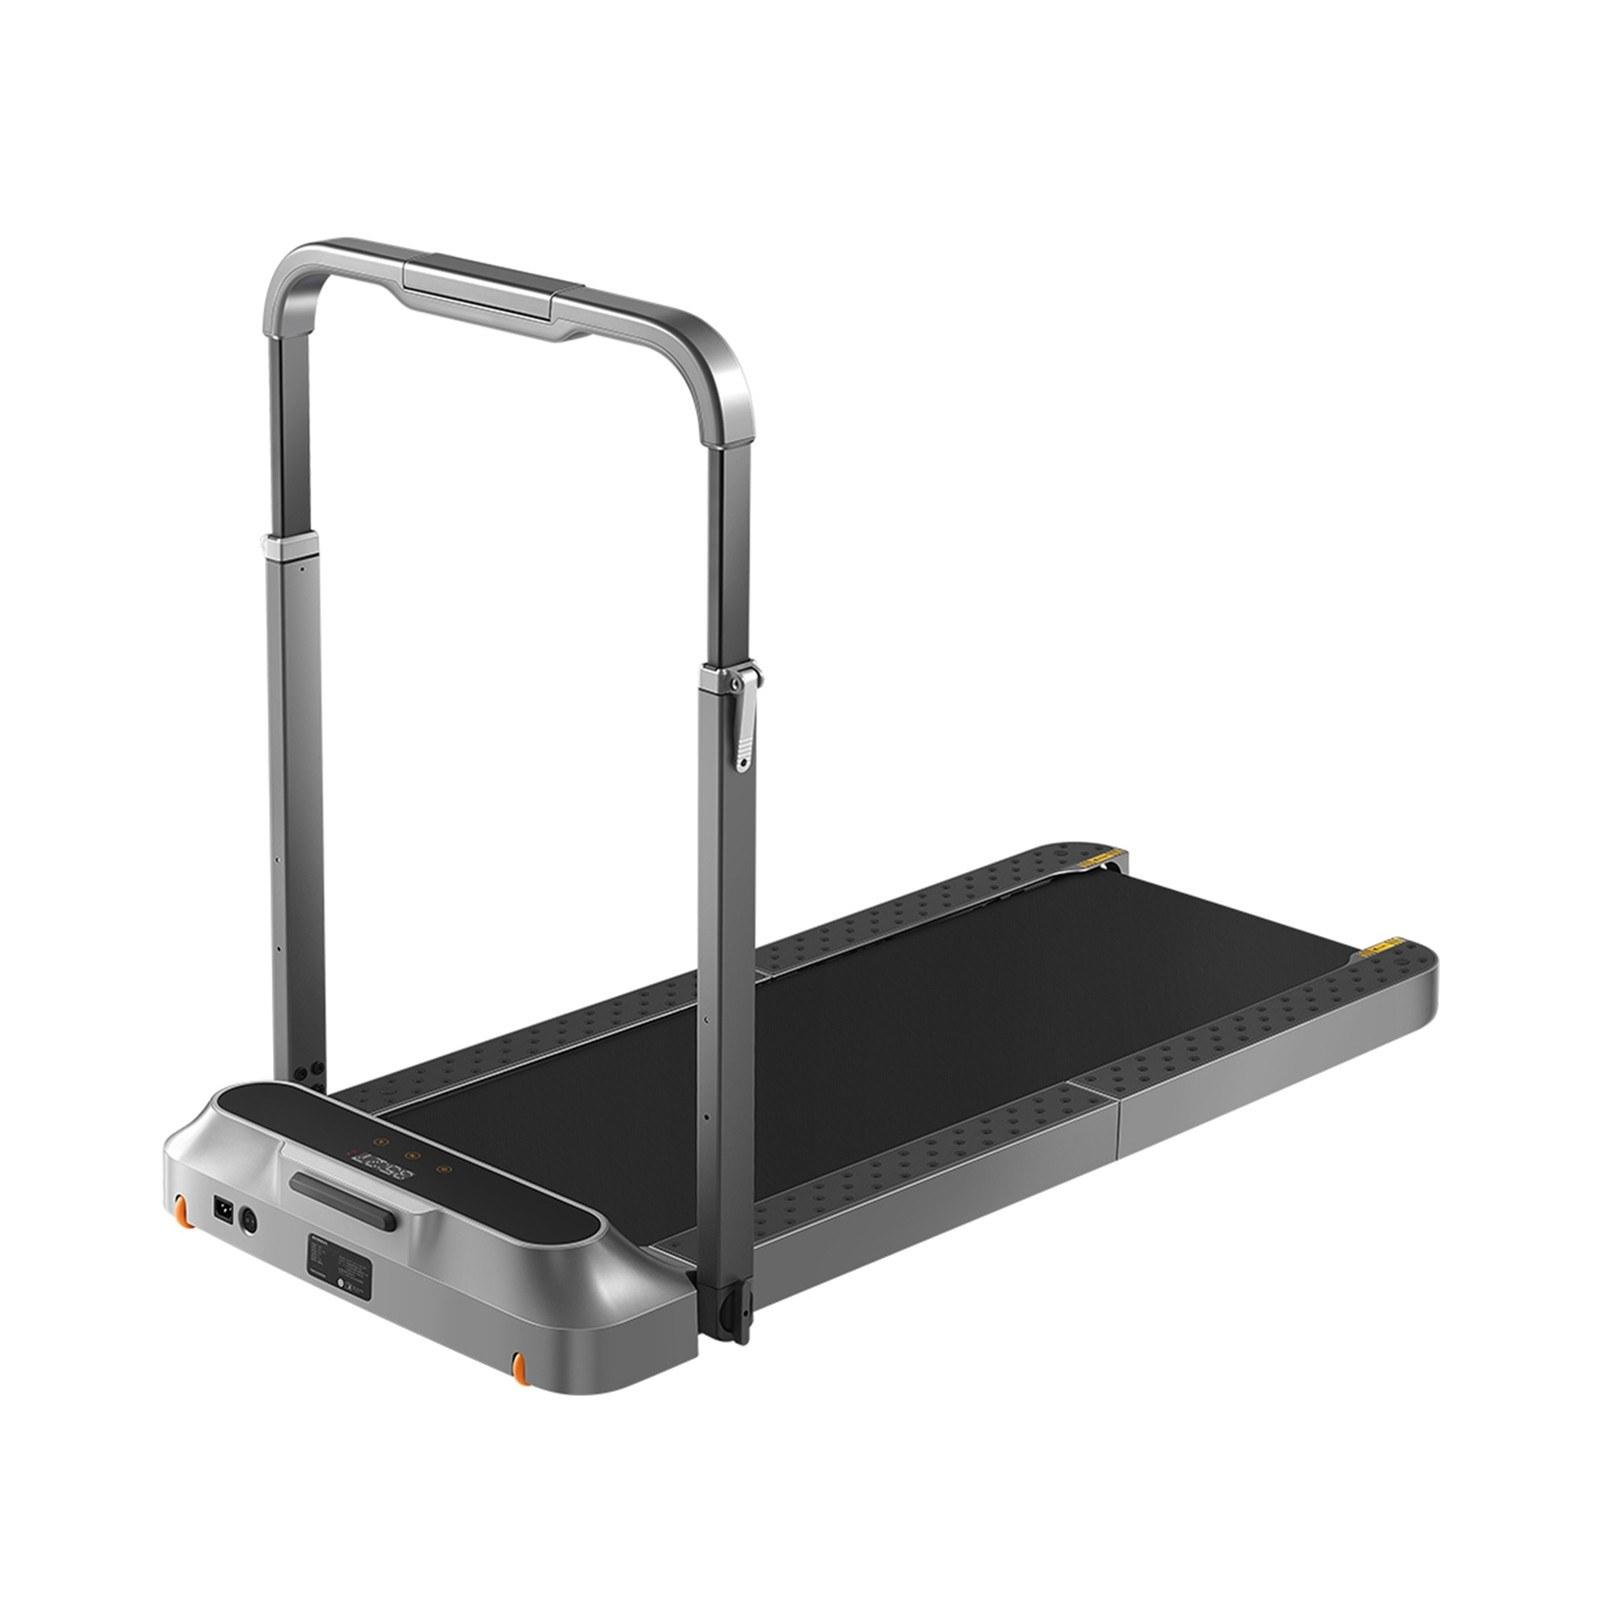 Cafago - 32% OFF Walking Pad R2 Folding Walking Pad Electric Exercise Running Walking Jogging Treadmill Machine,free shipping+$812.26